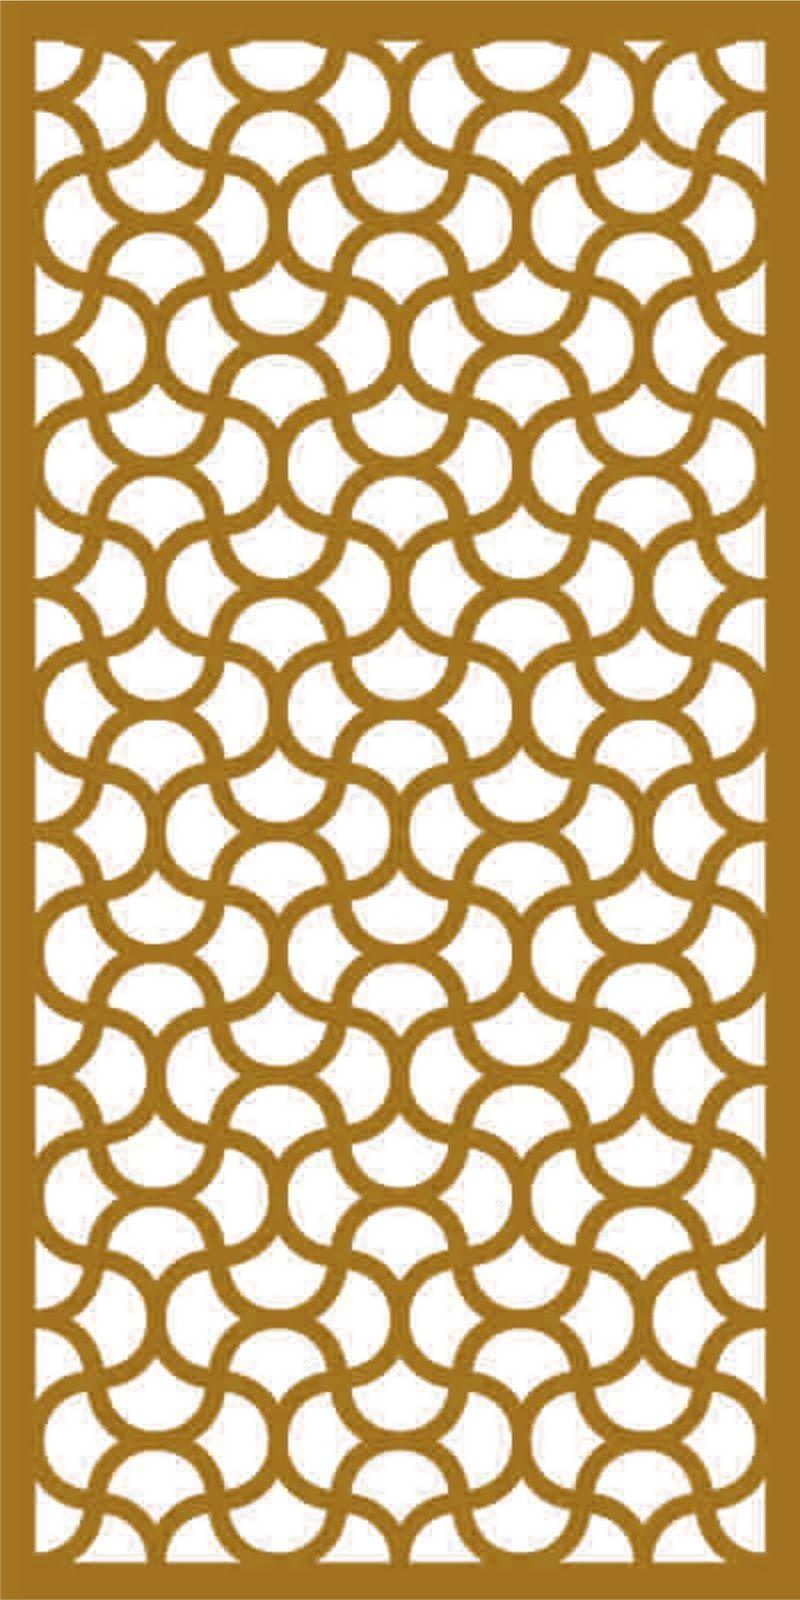 Katalog 2d Panel Design A Tasarim Cizimler